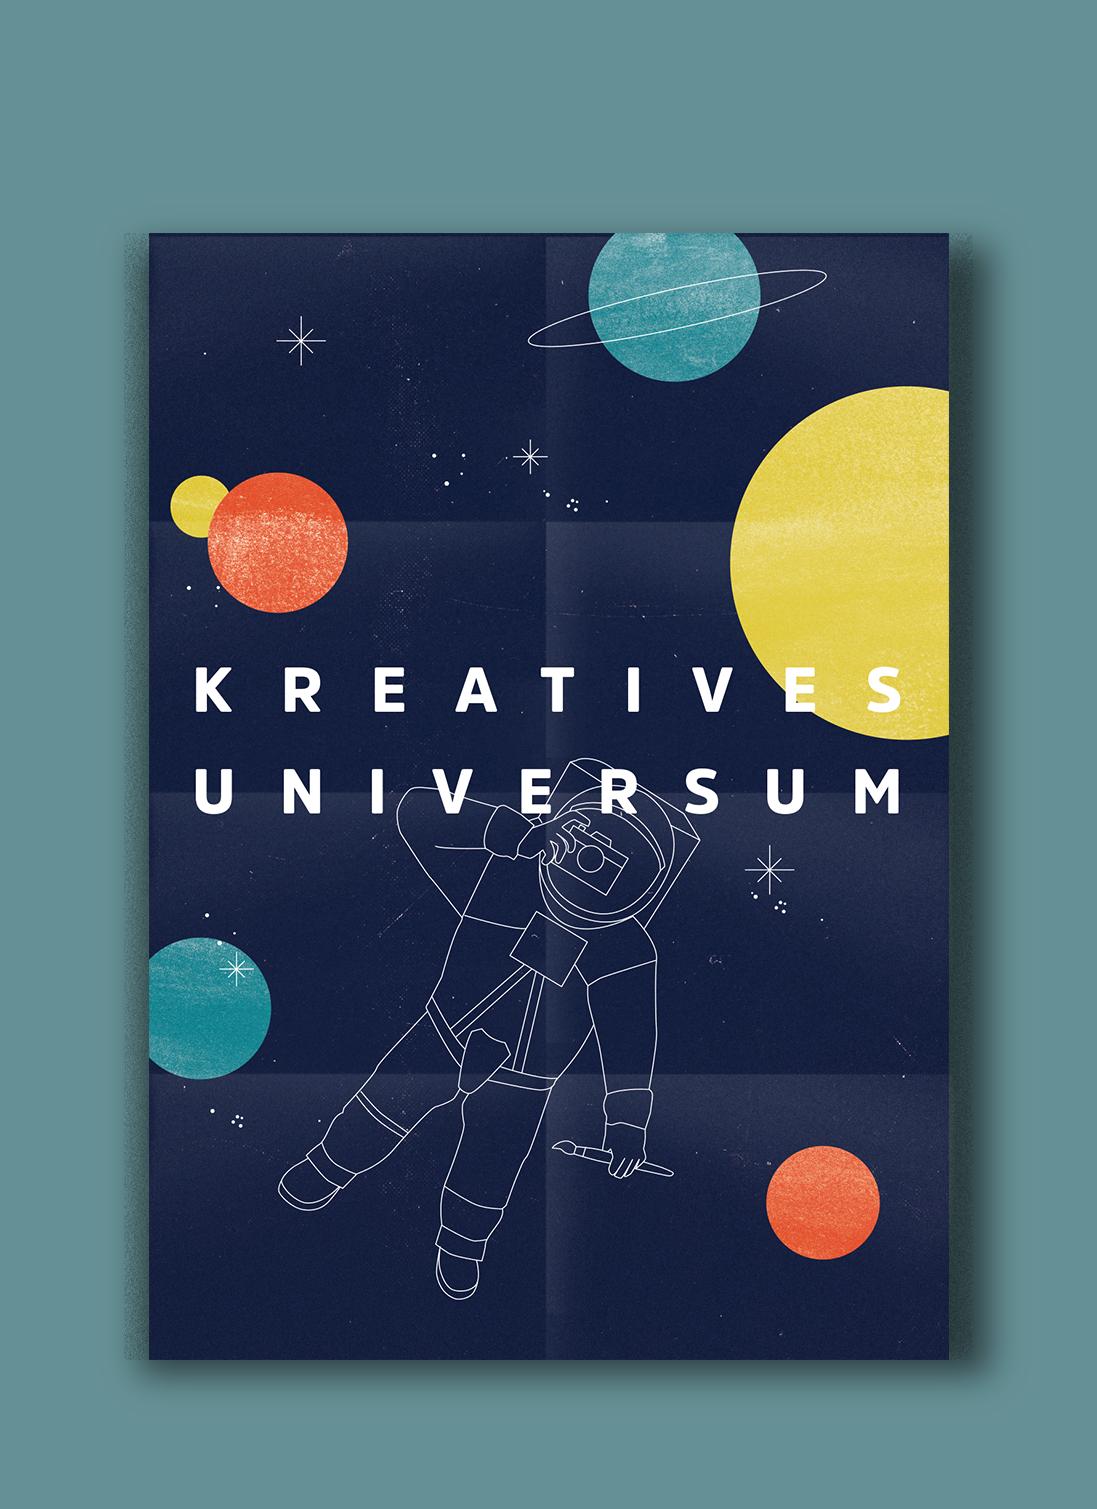 KreativesUniversum_poster_Programm_mockup_